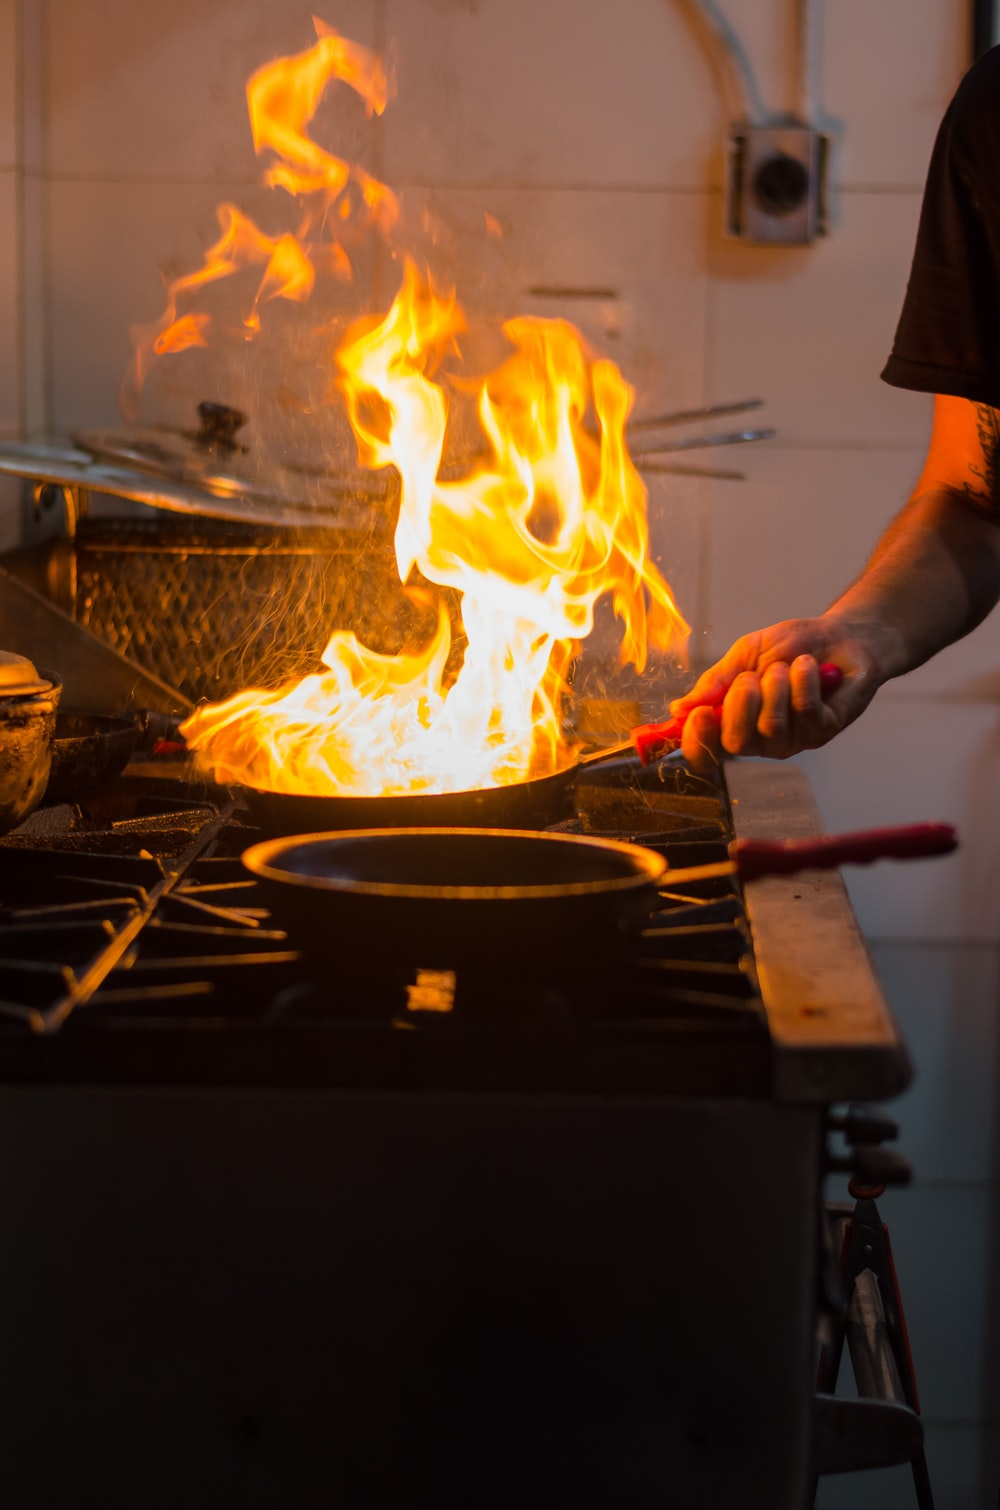 fire on pan